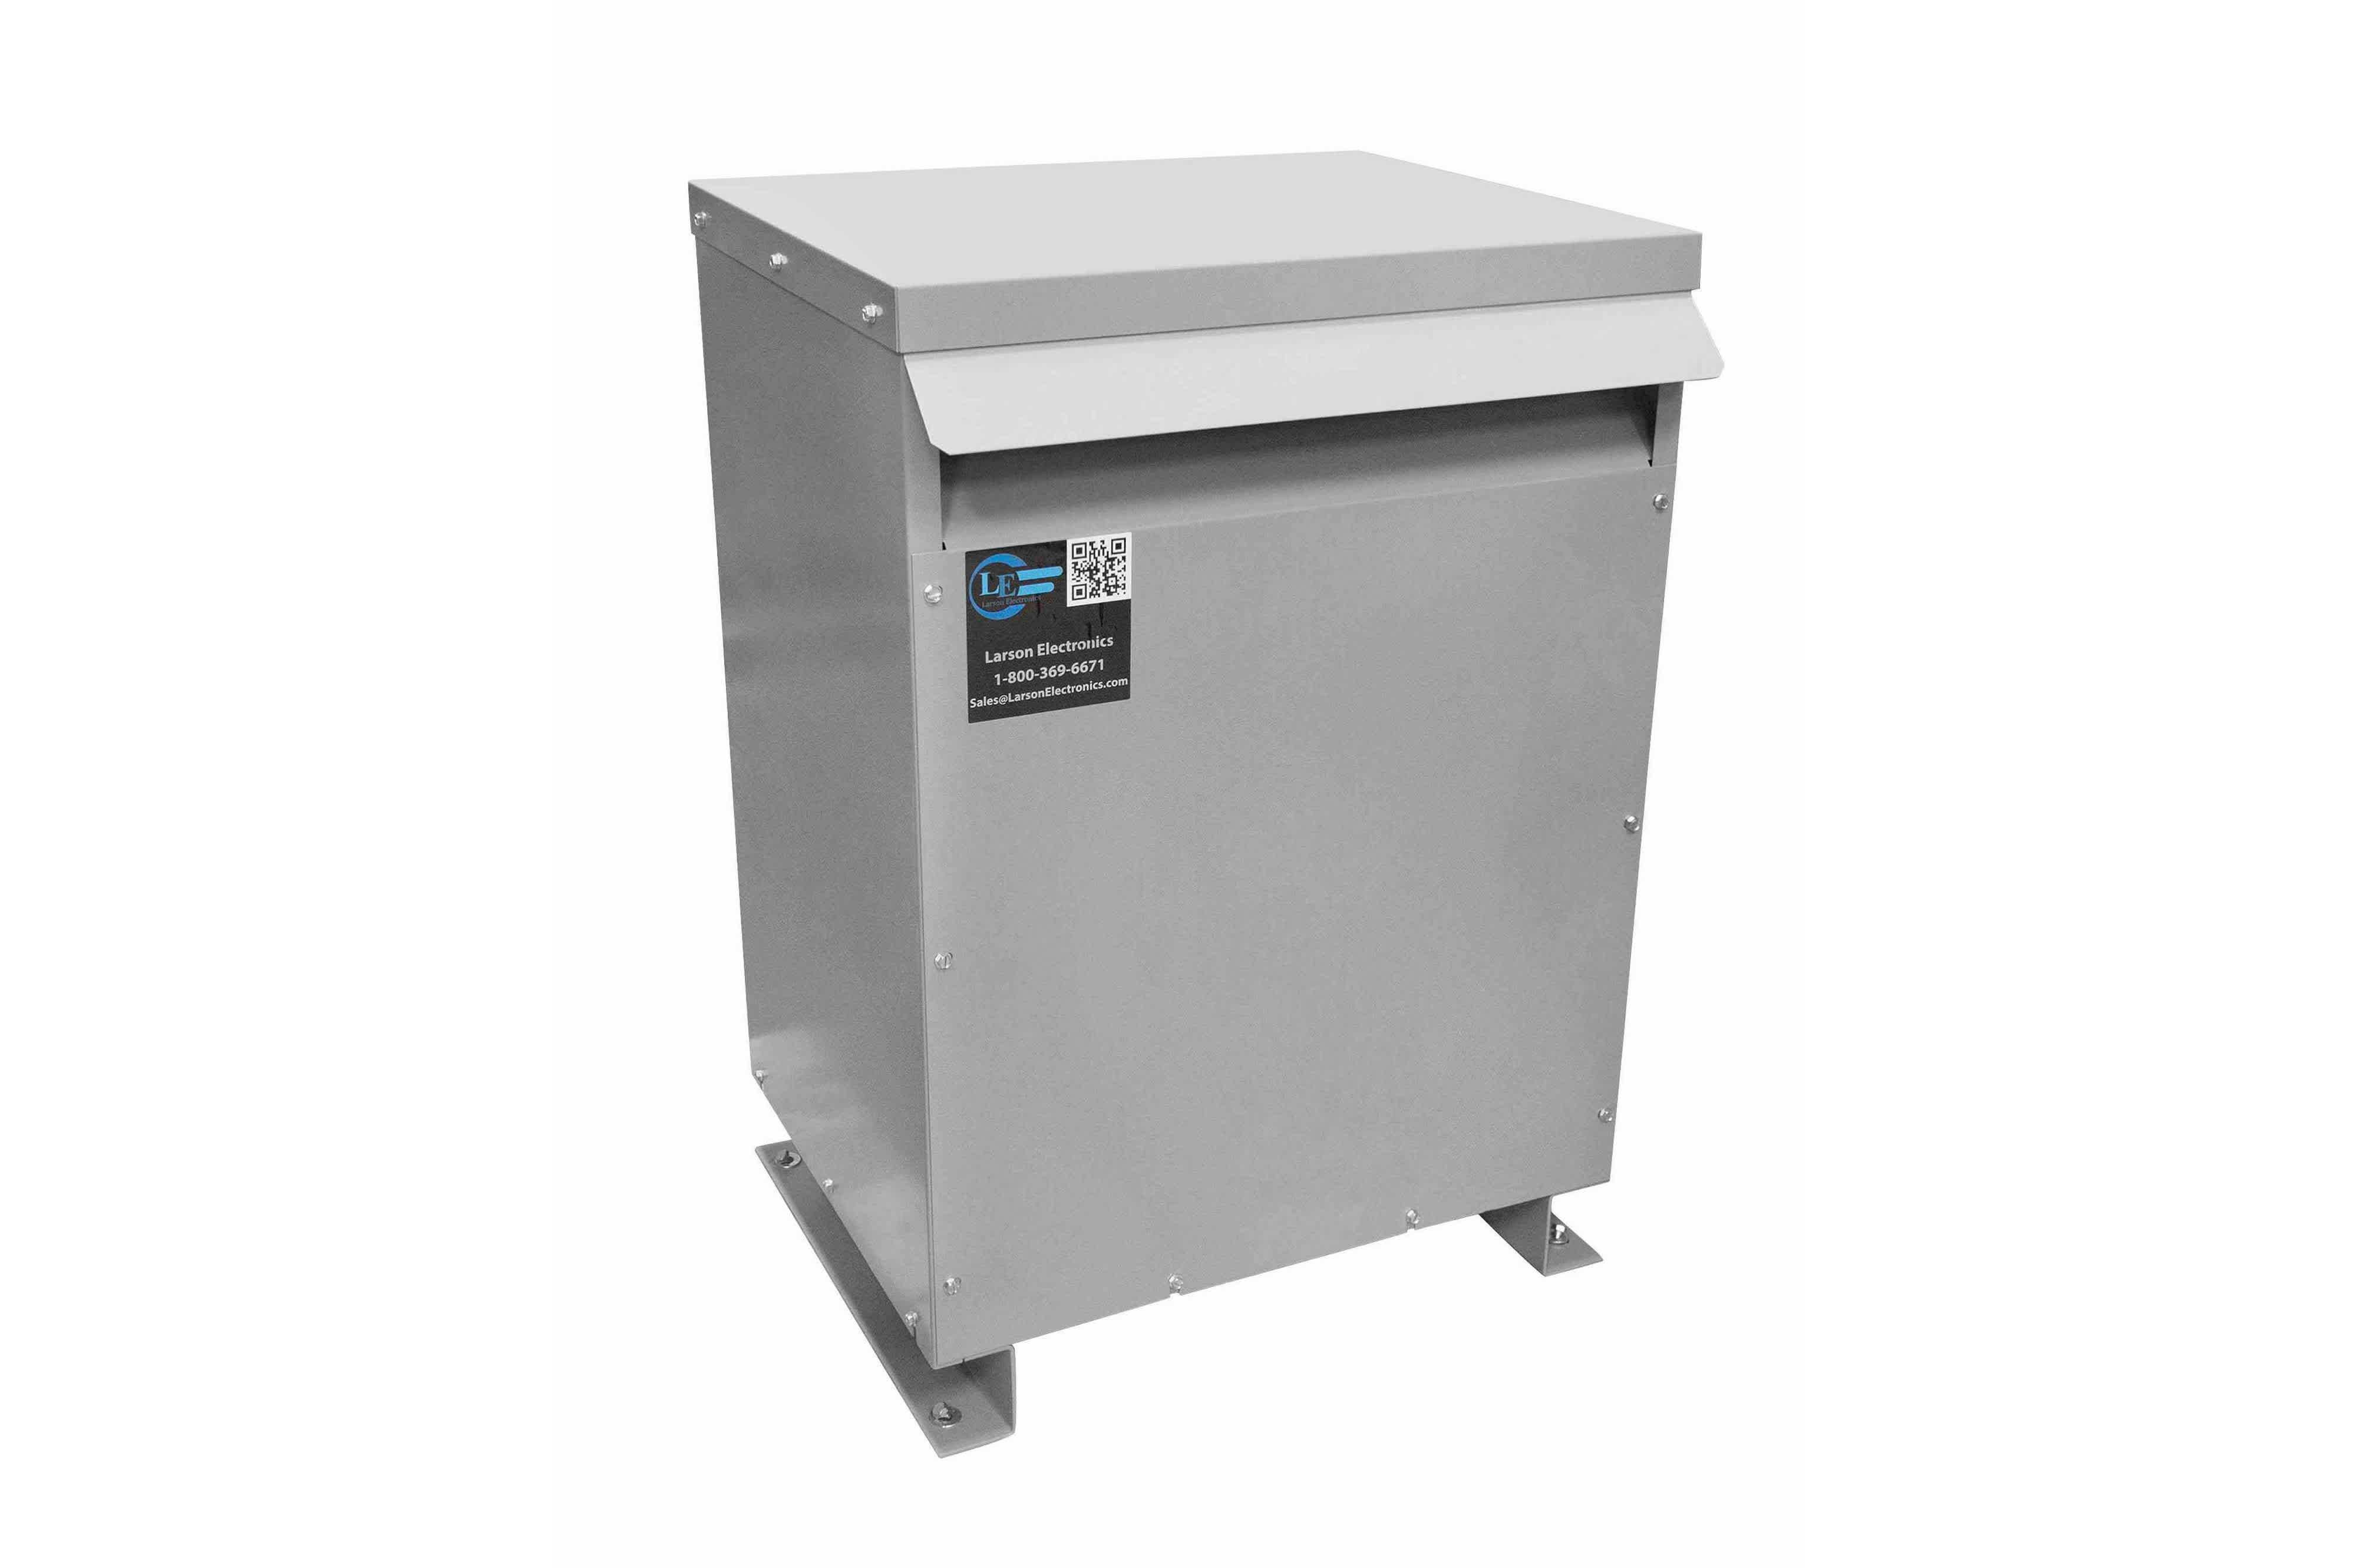 15 kVA 3PH Isolation Transformer, 600V Wye Primary, 240V Delta Secondary, N3R, Ventilated, 60 Hz